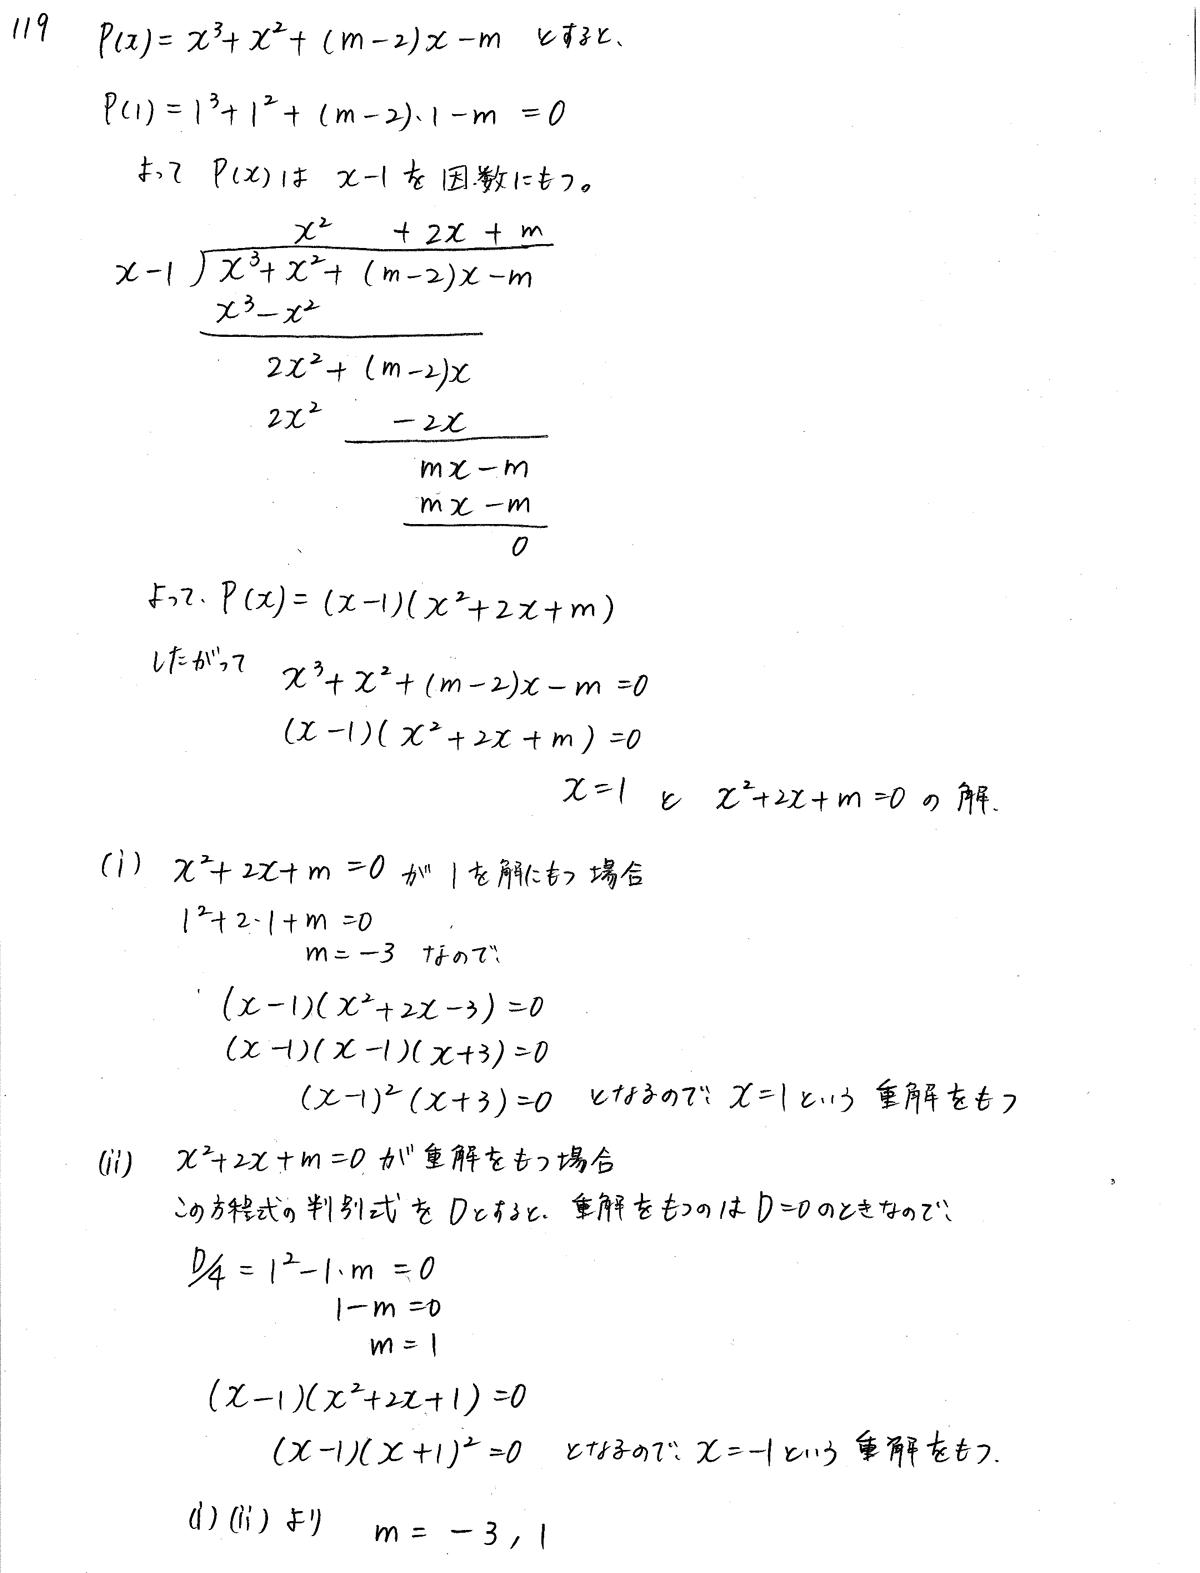 3TRIAL数学2-119解答